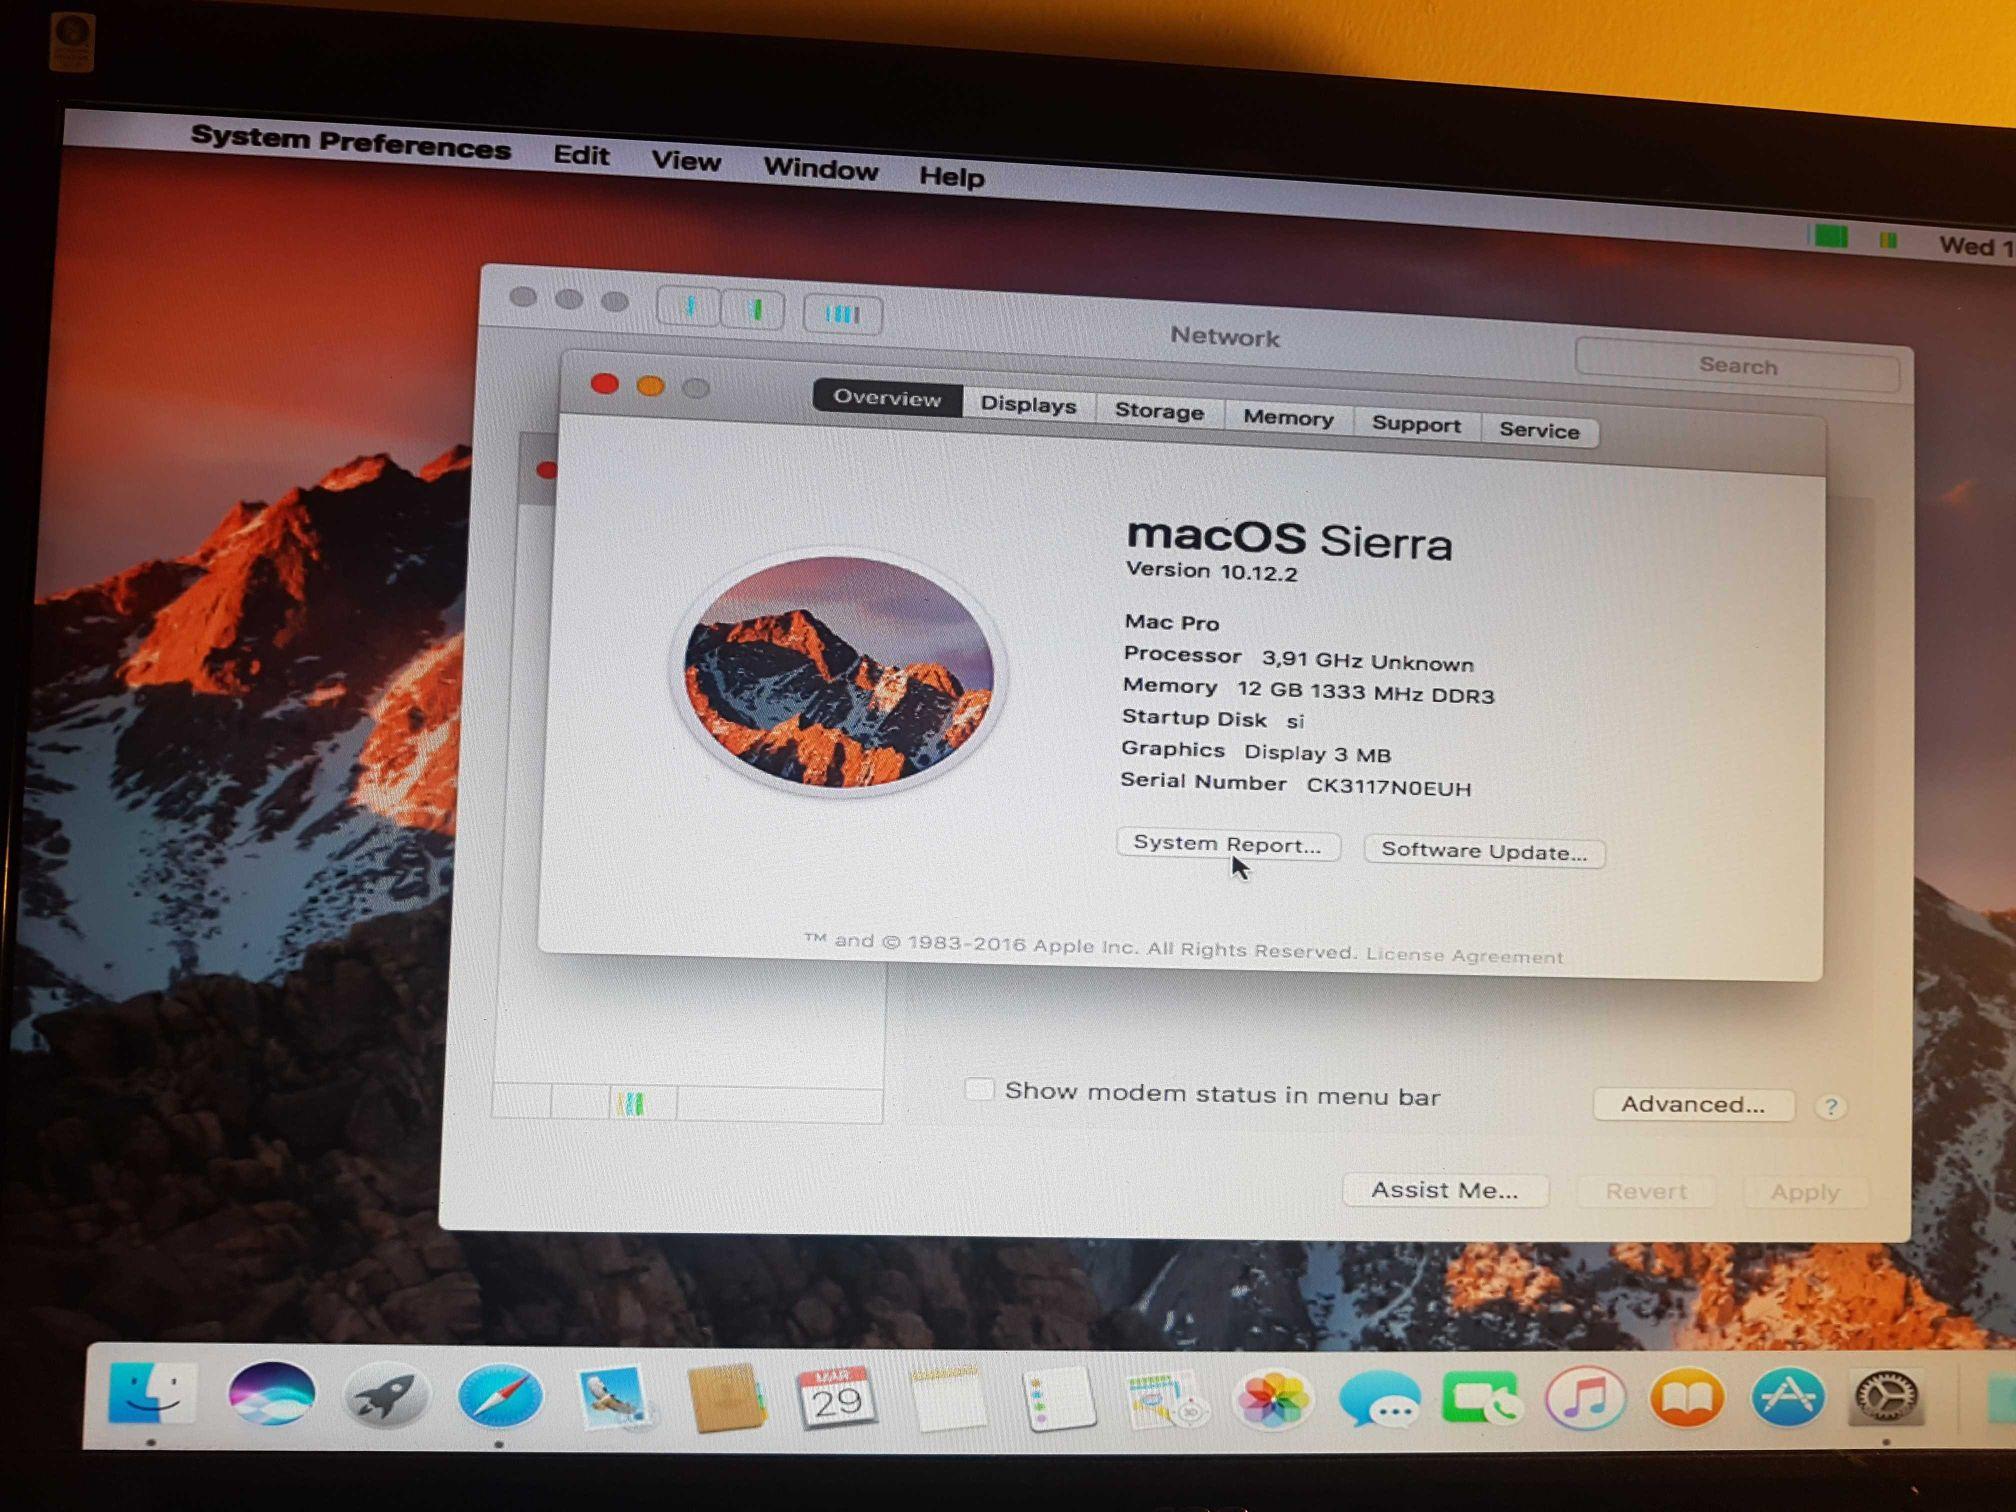 Asus m5a97 R2 0 + nvidia gtx 960 strix - Page 4 - AMD OS X